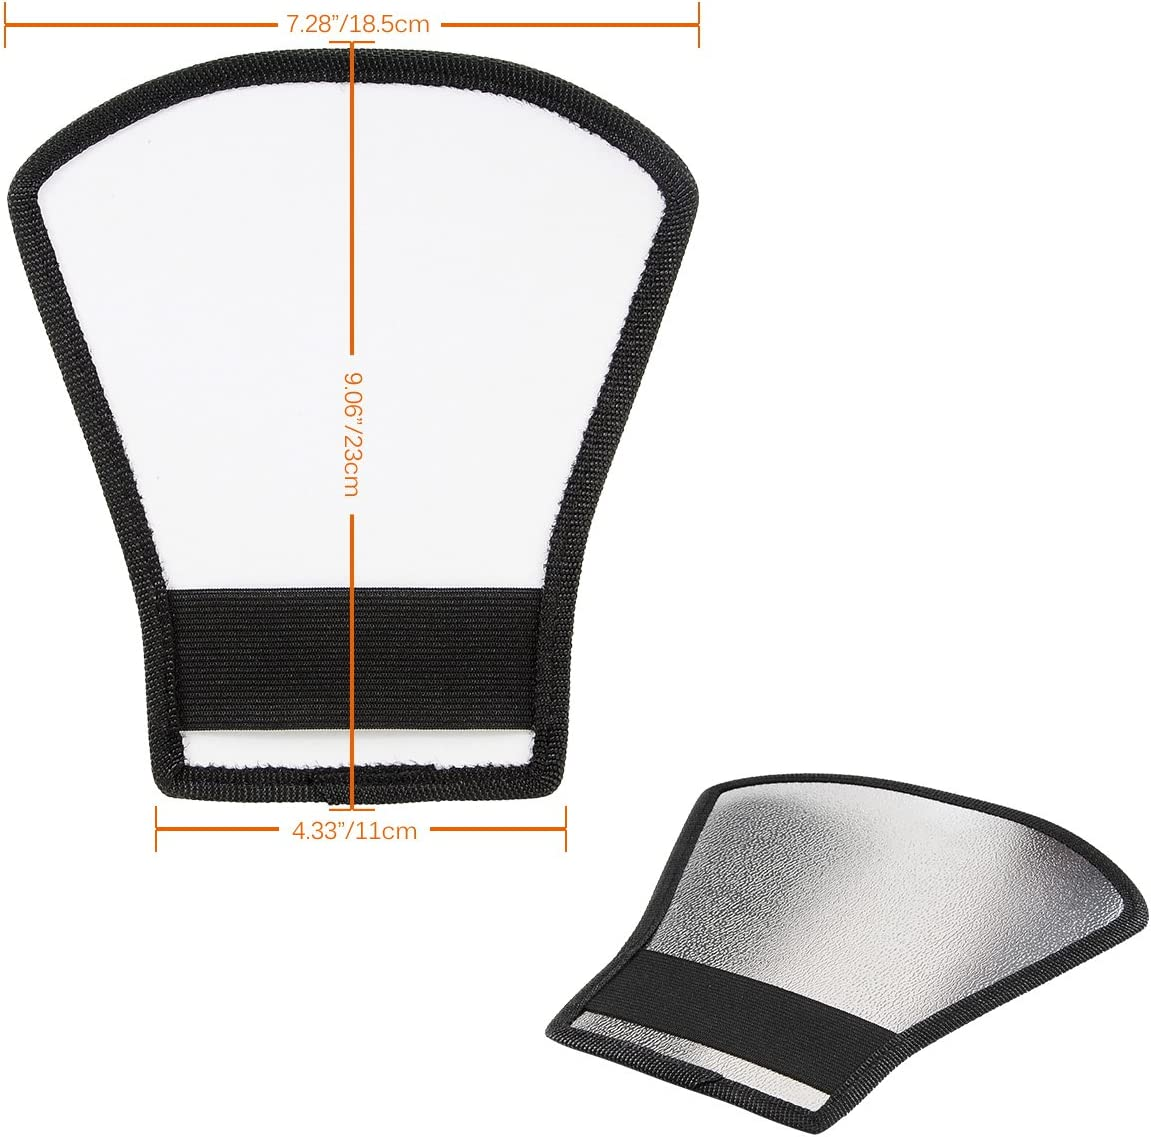 Bigking Diffusor Softbox Universal Runde Faltbare Diffusor Softbox Shoot Makro Blitzlicht Lampenhaube